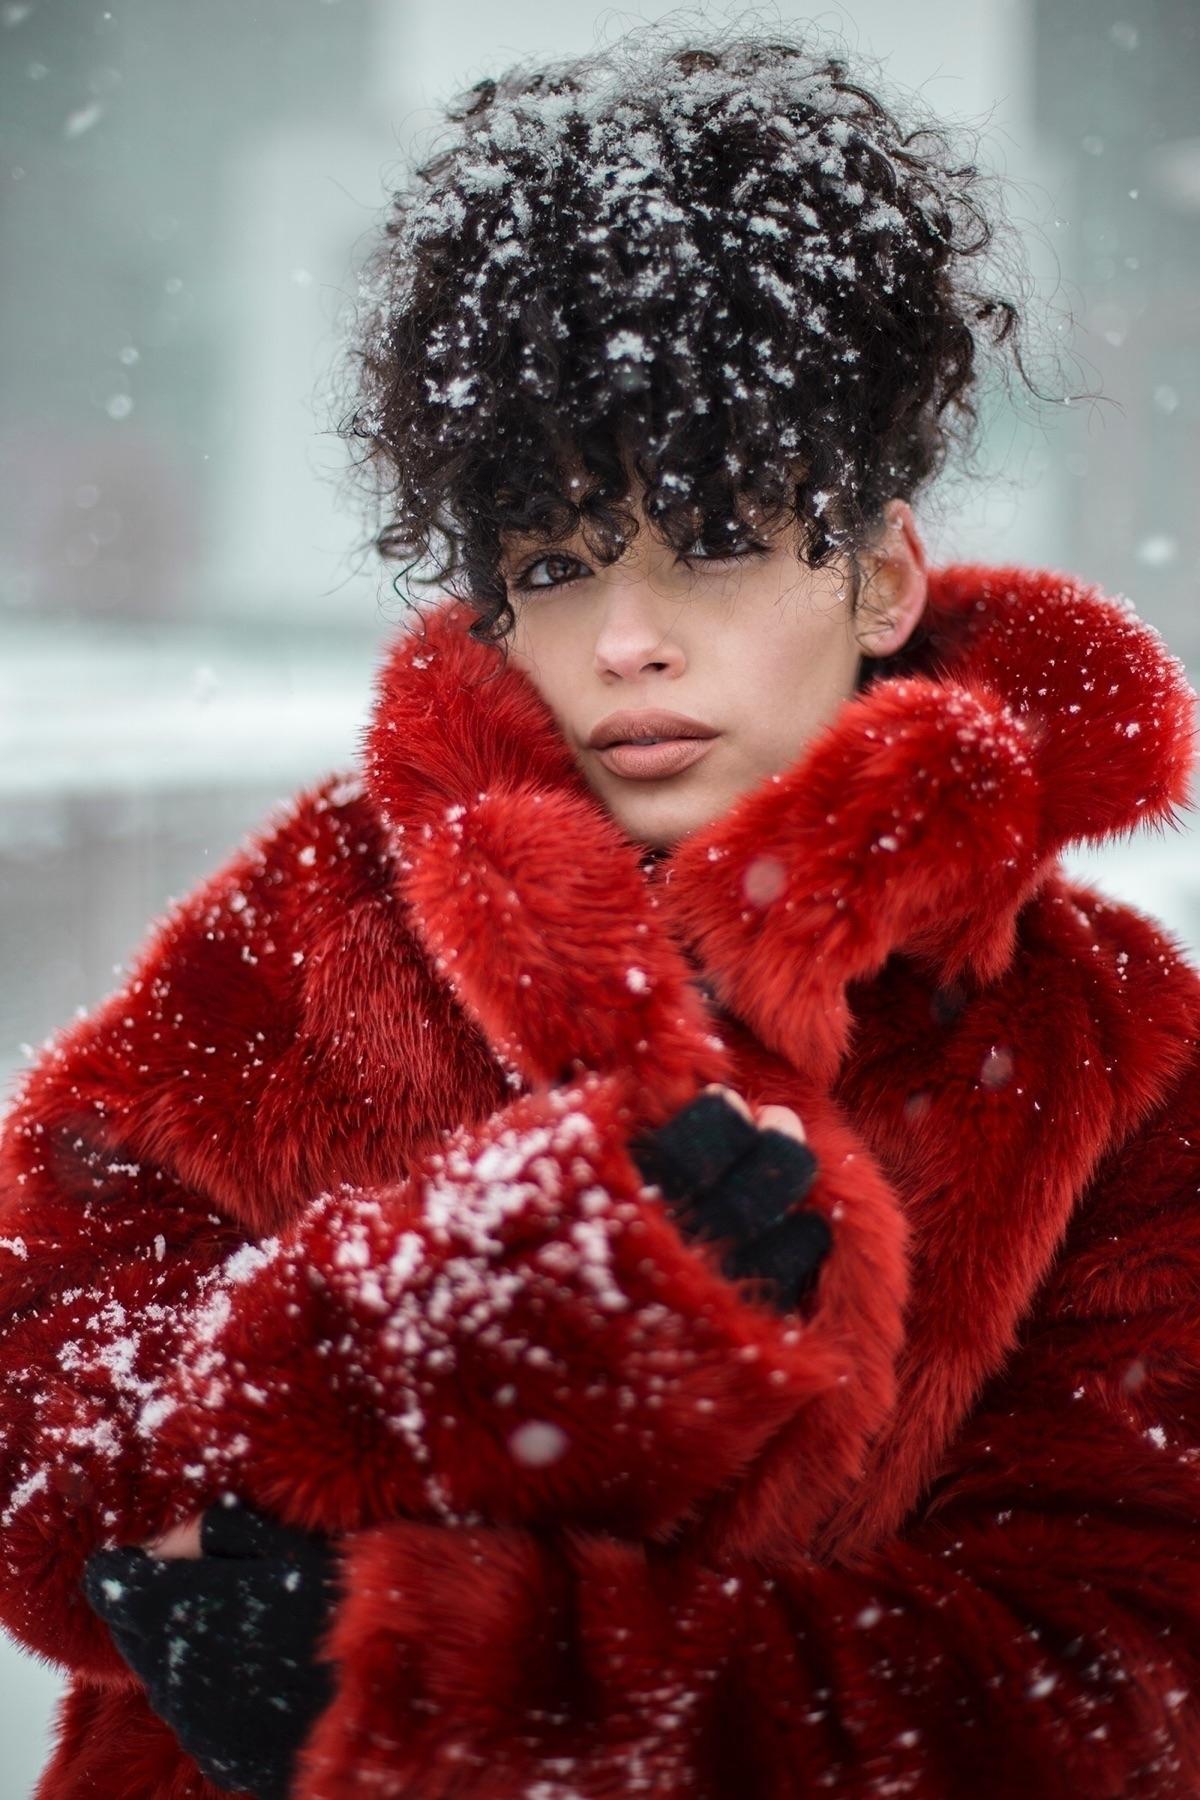 Snow days NYC - edwardanthonyphotography   ello